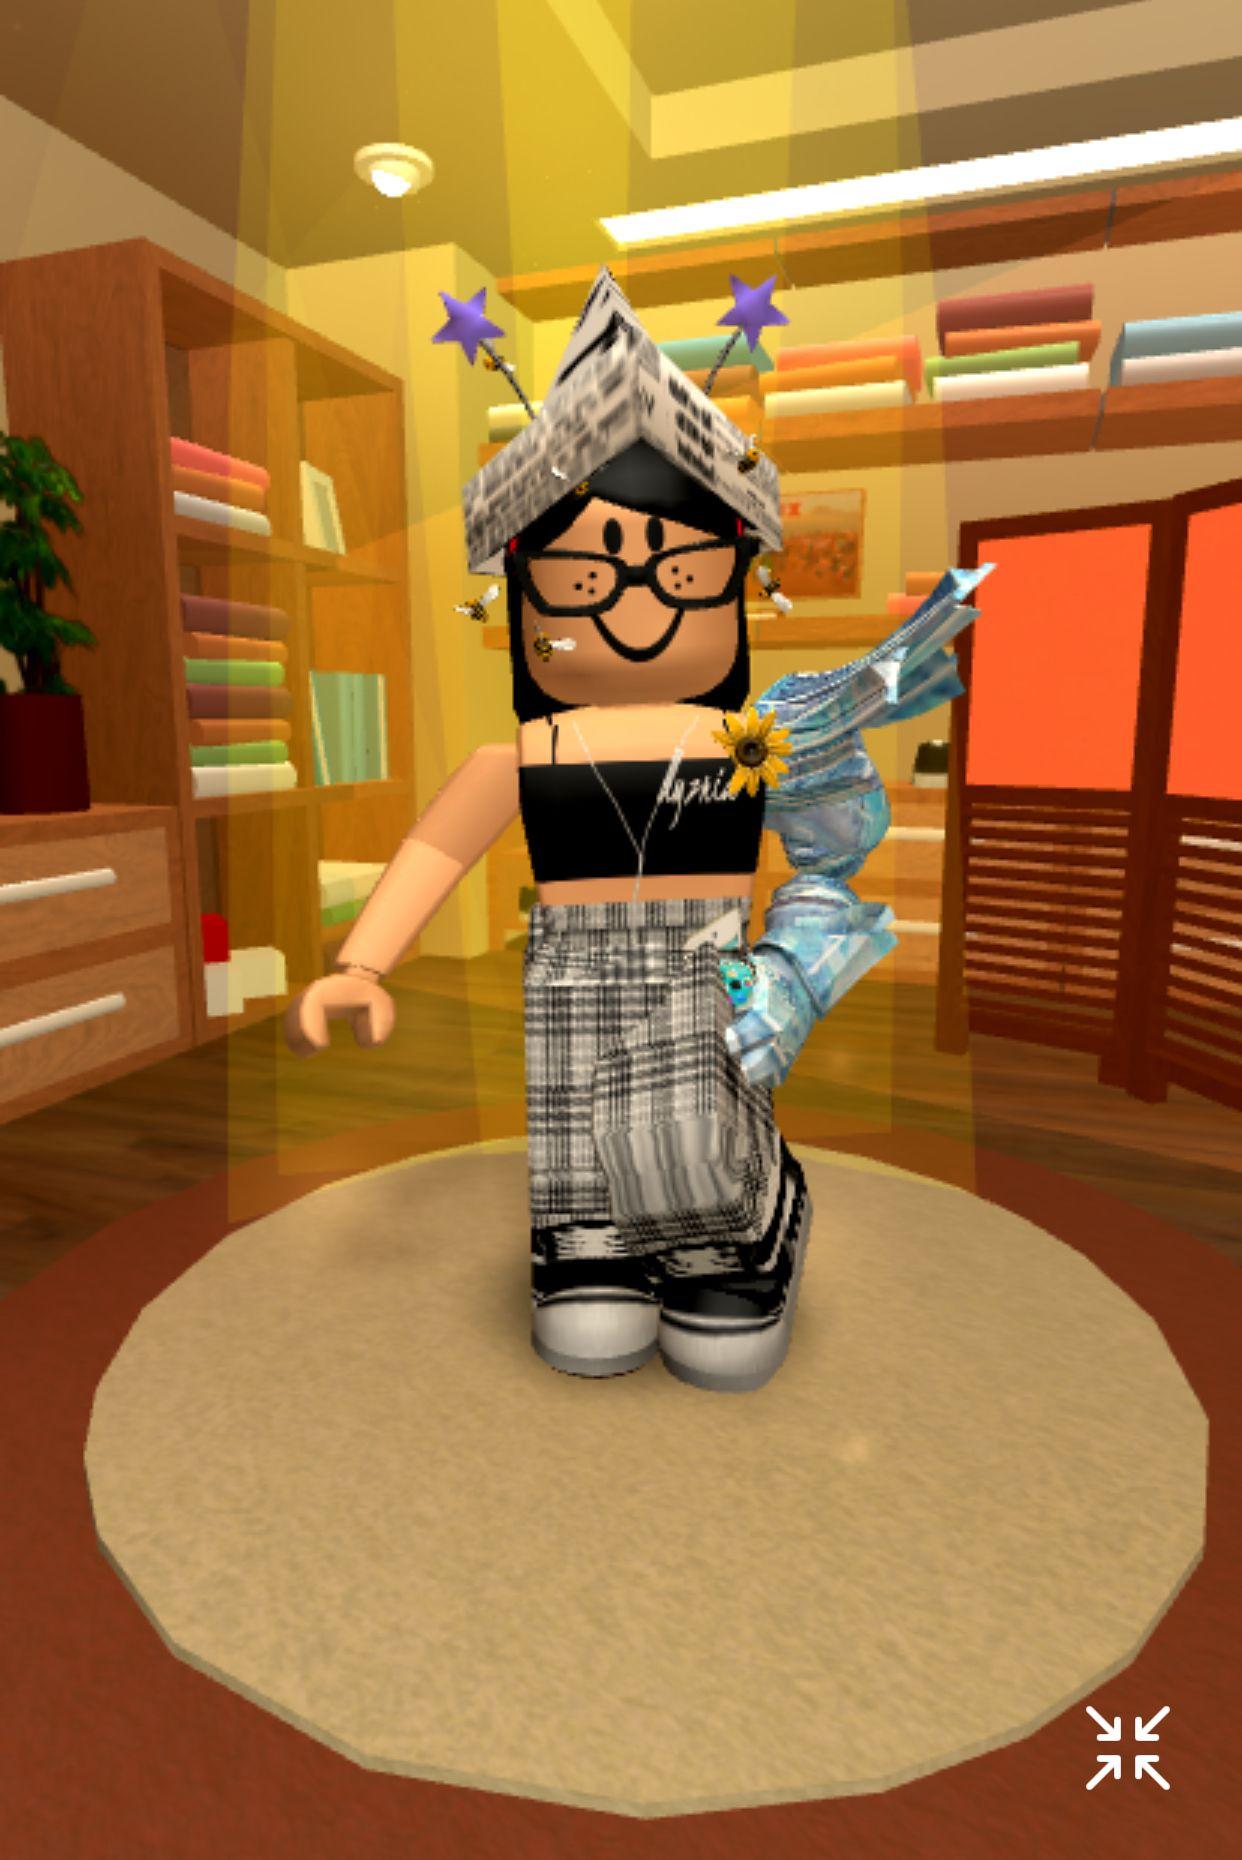 Aesthetic Outfits Roblox : aesthetic, outfits, roblox, Nadirah, Avatars,, Roblox, Pictures,